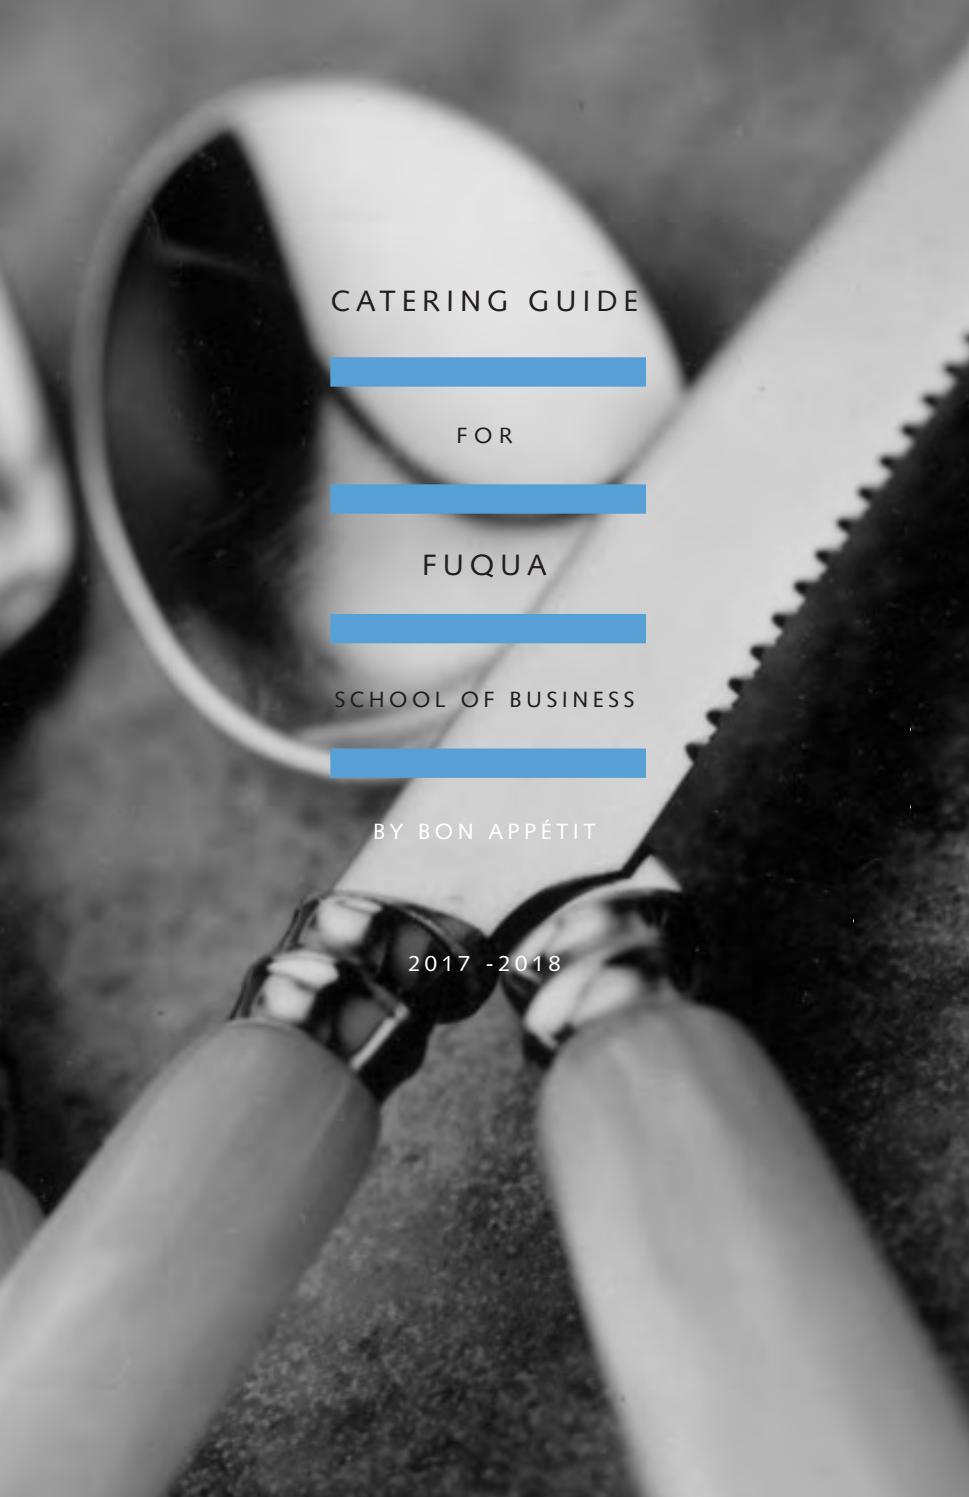 Fuqua Catering Menu By Compass Group USA   Issuu